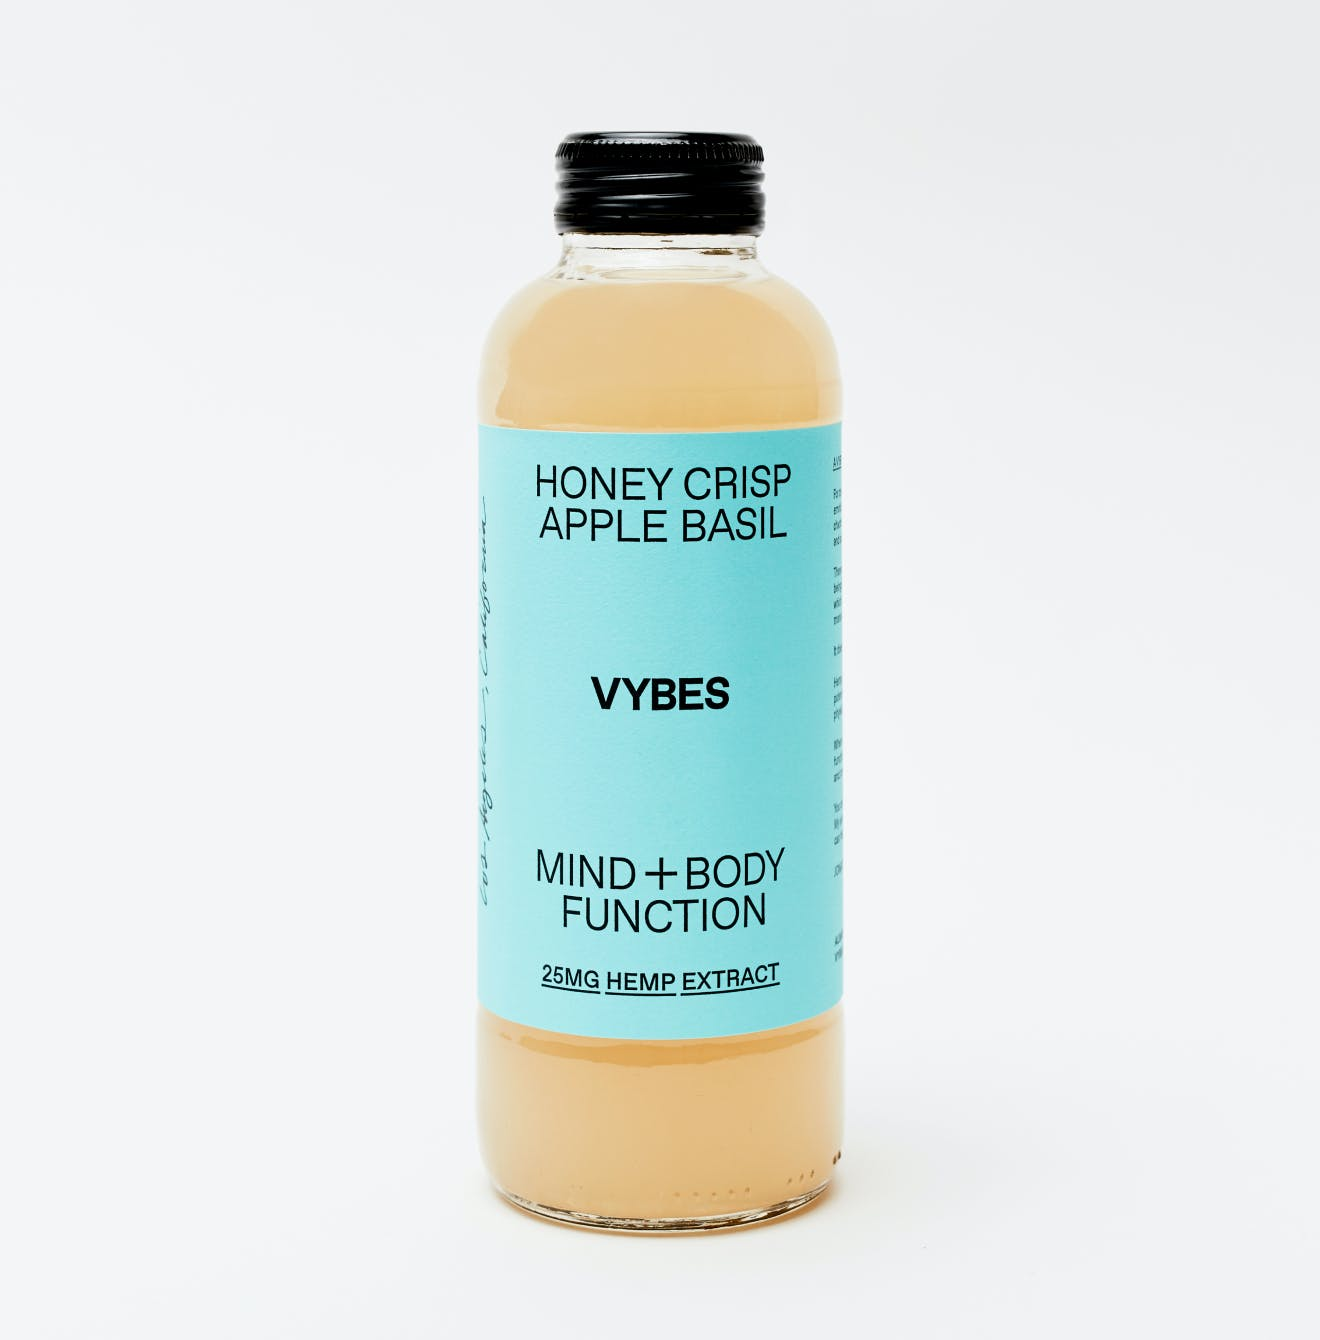 Honeycrisp Apple Basil VYBES 1